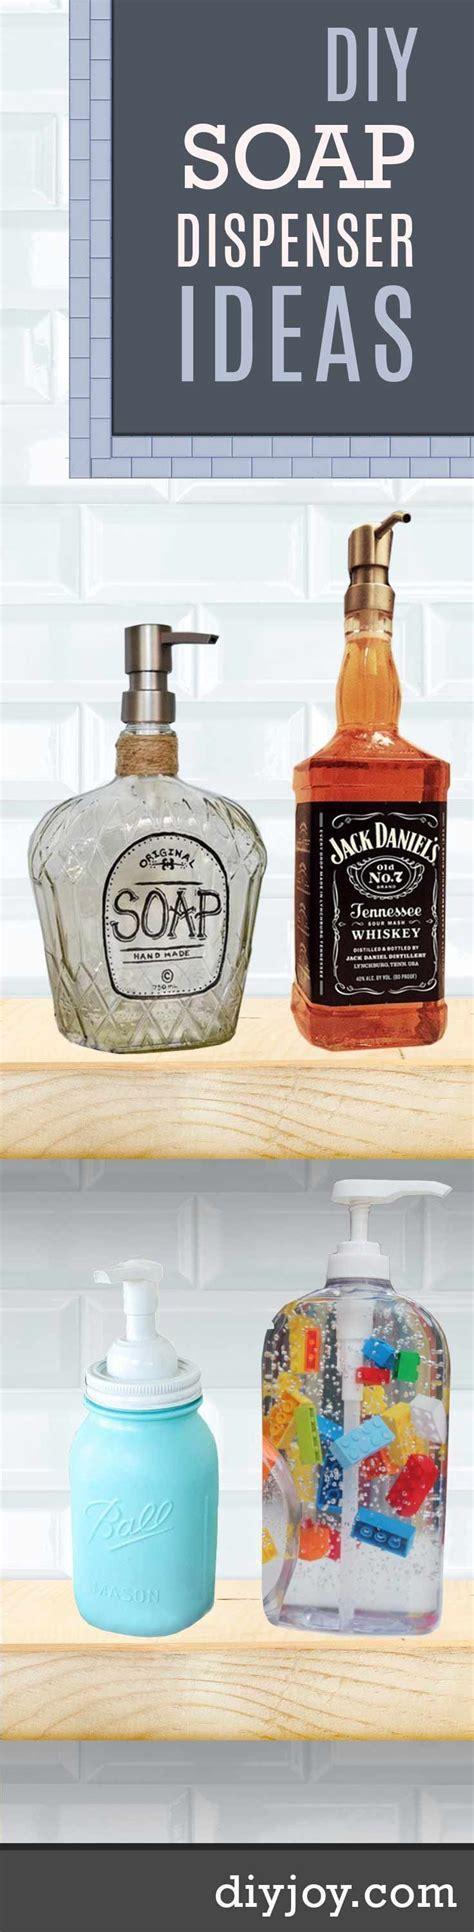 diy liquor ideas best 25 empty liquor bottles ideas on pinterest liquor